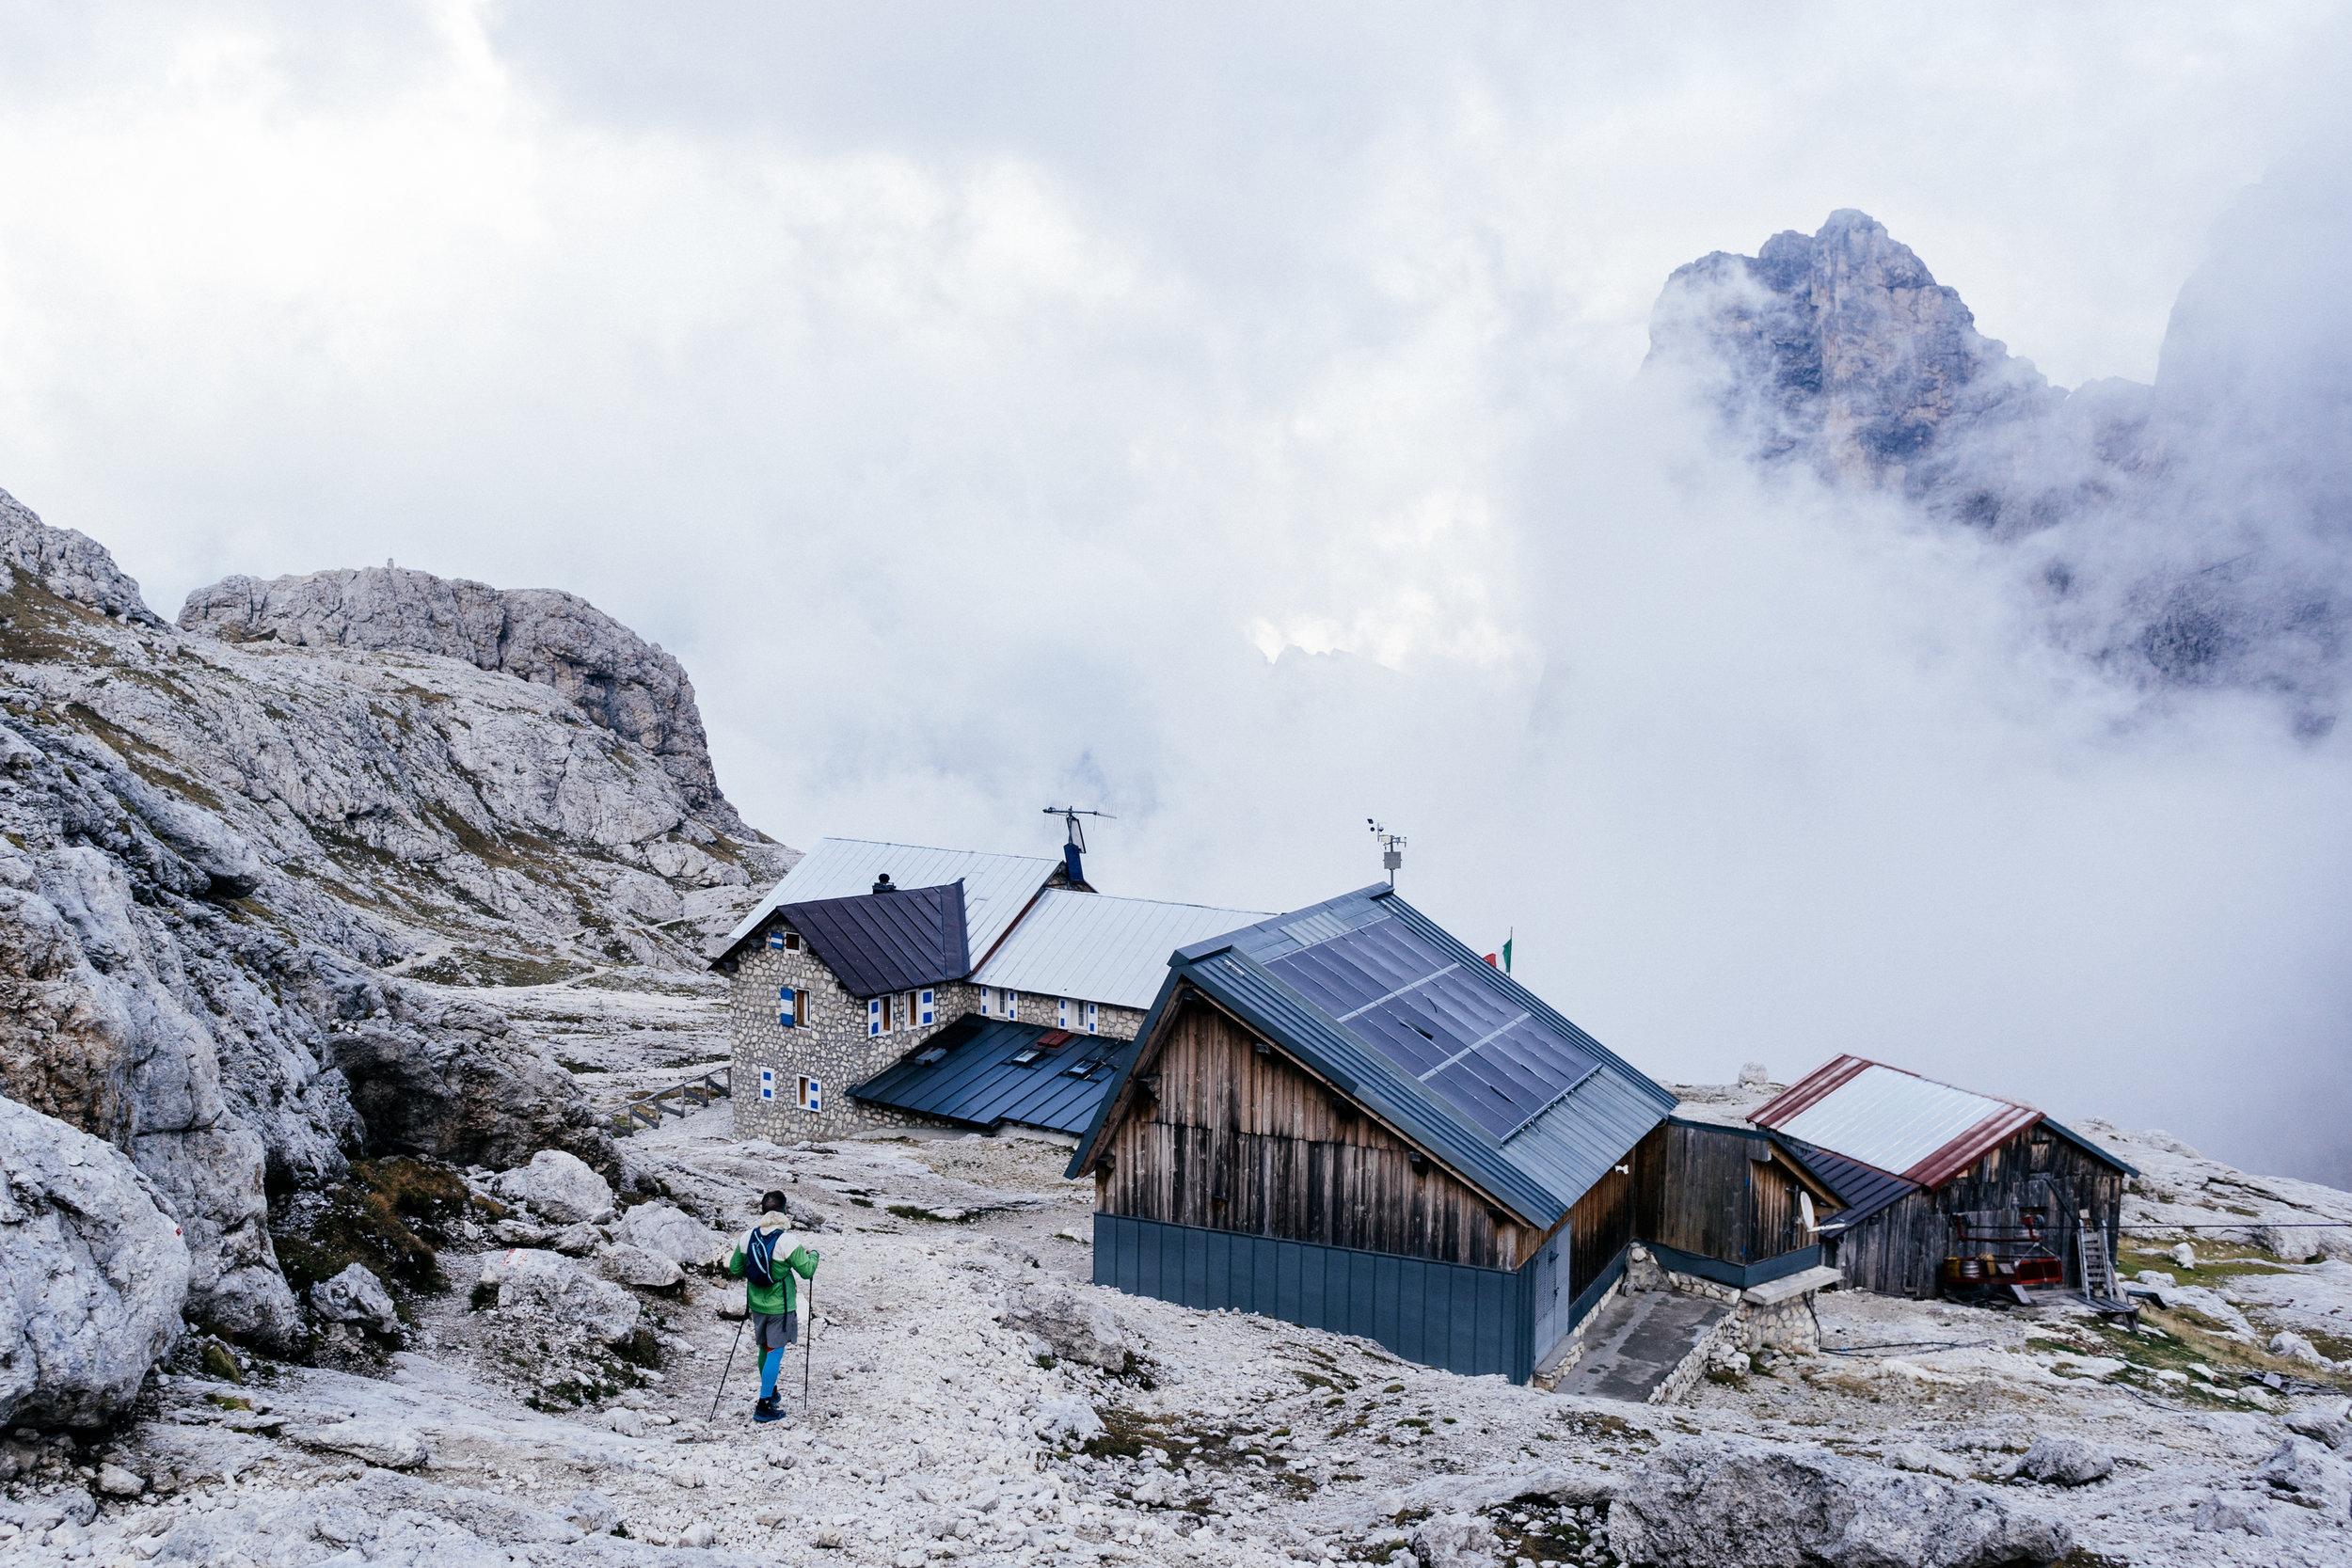 Dolomites-ChrisBrinleeJr-SEP17-81.jpg